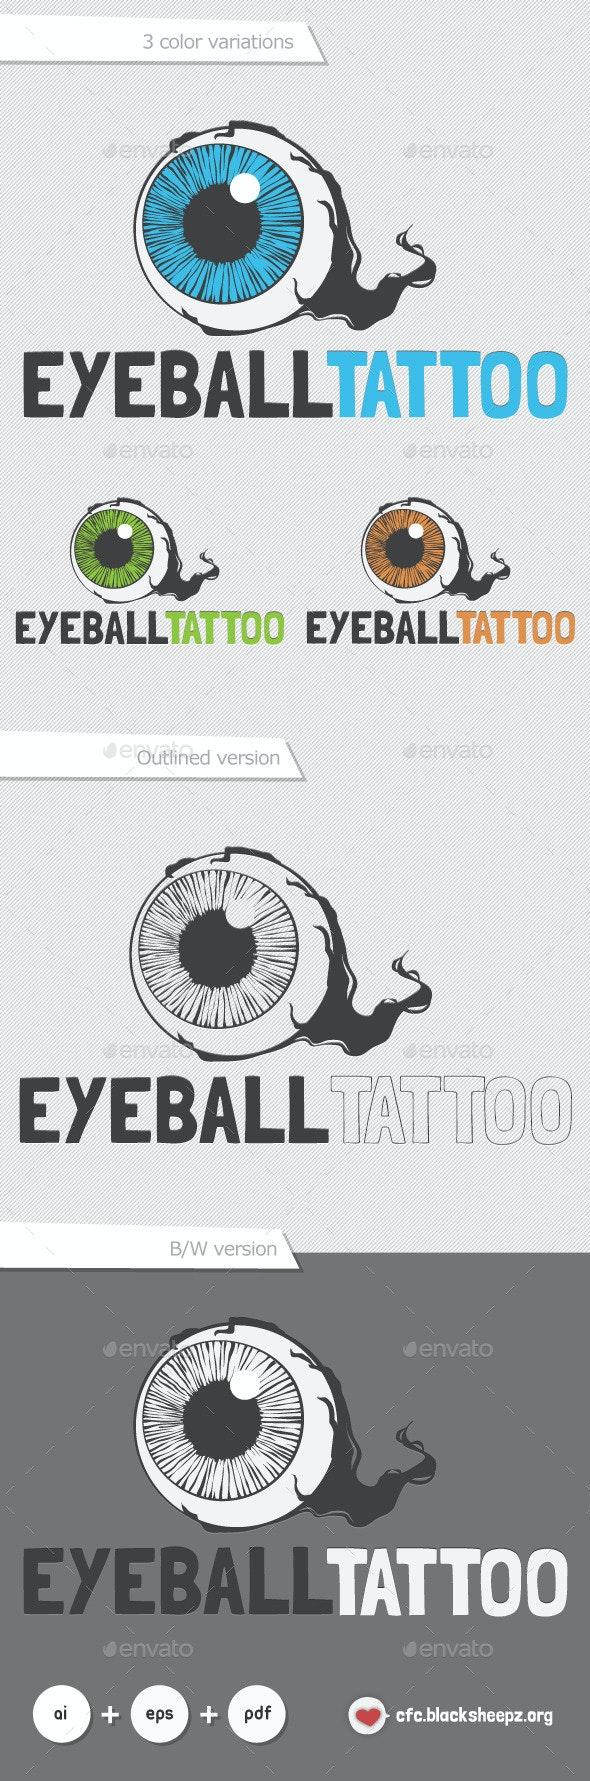 Eyeball Tattoo - Vector Abstract